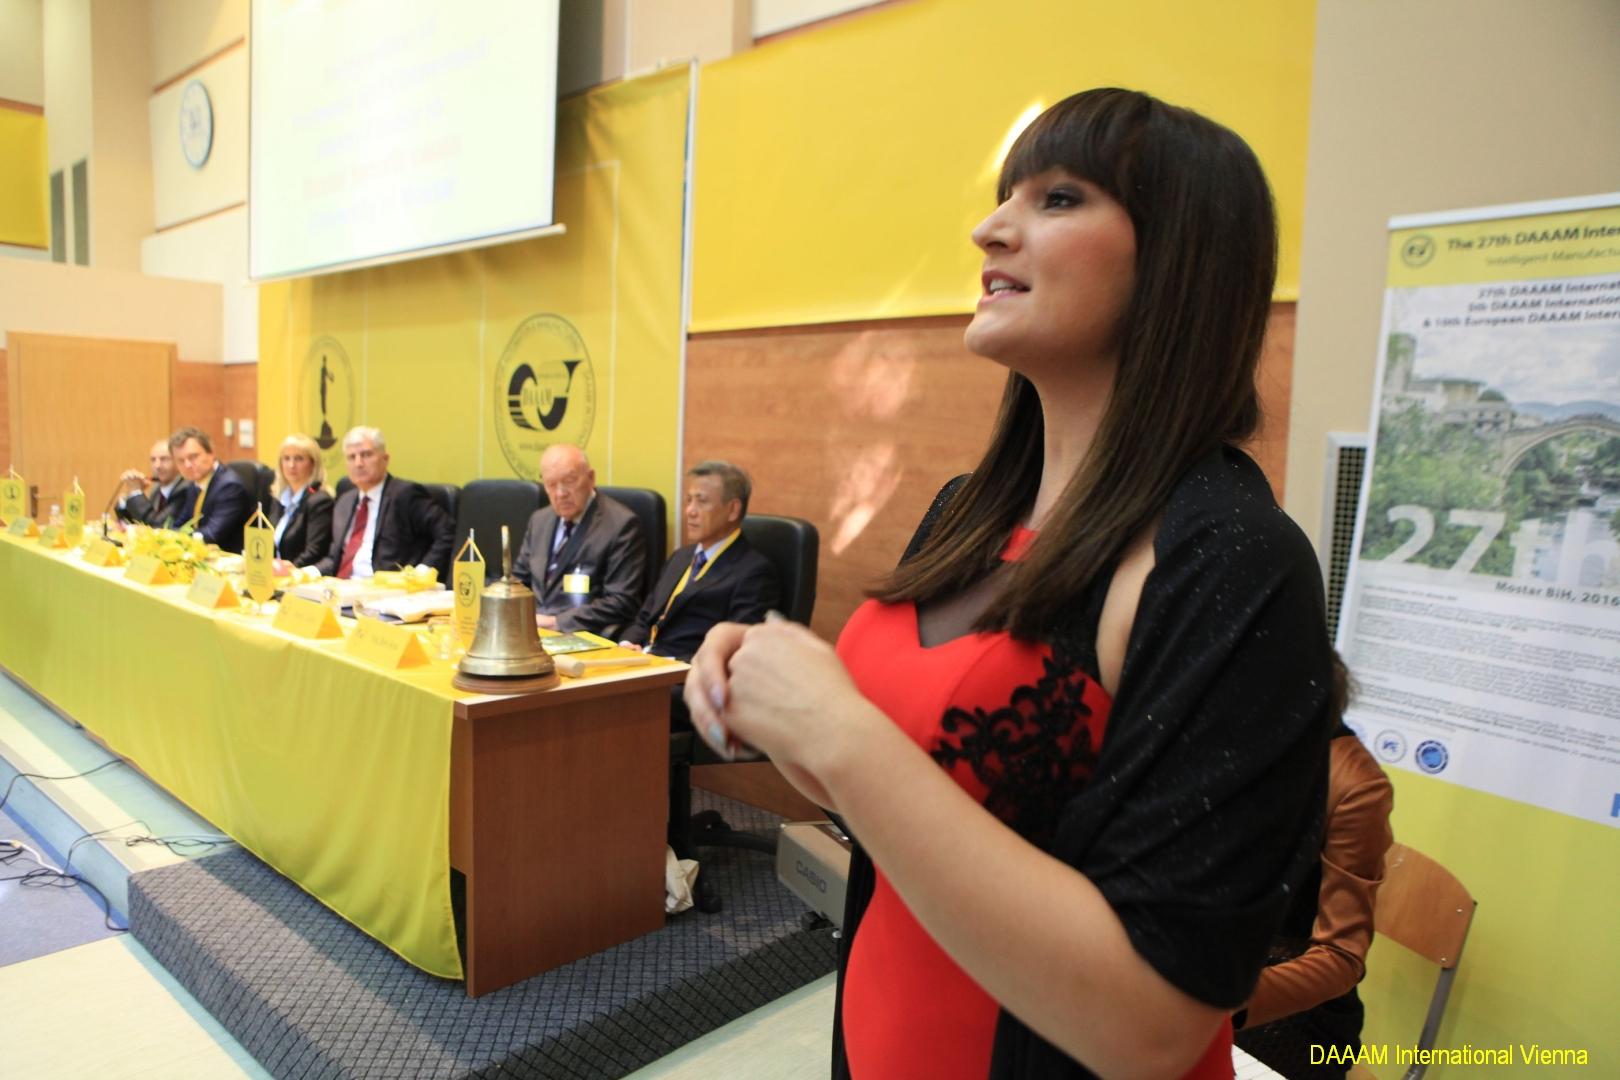 DAAAM_2016_Mostar_06_Professor_and_Cosmonaut_Alexey_Eliseev_Doctor_honors_causa_036